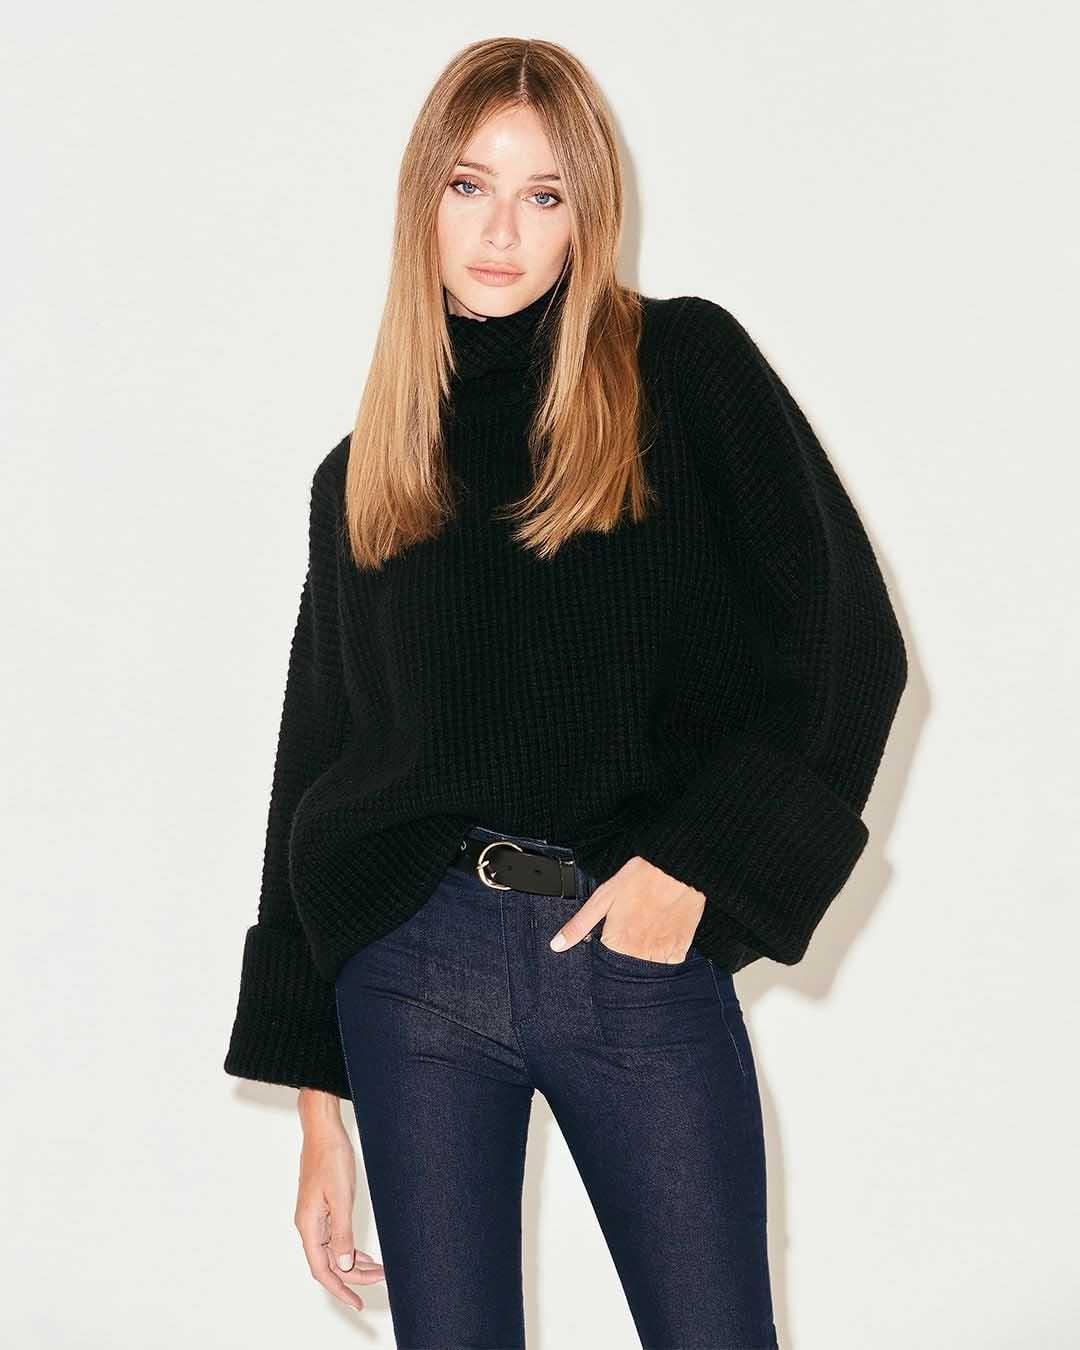 polerones tejidos invierno 2021 moda mujer